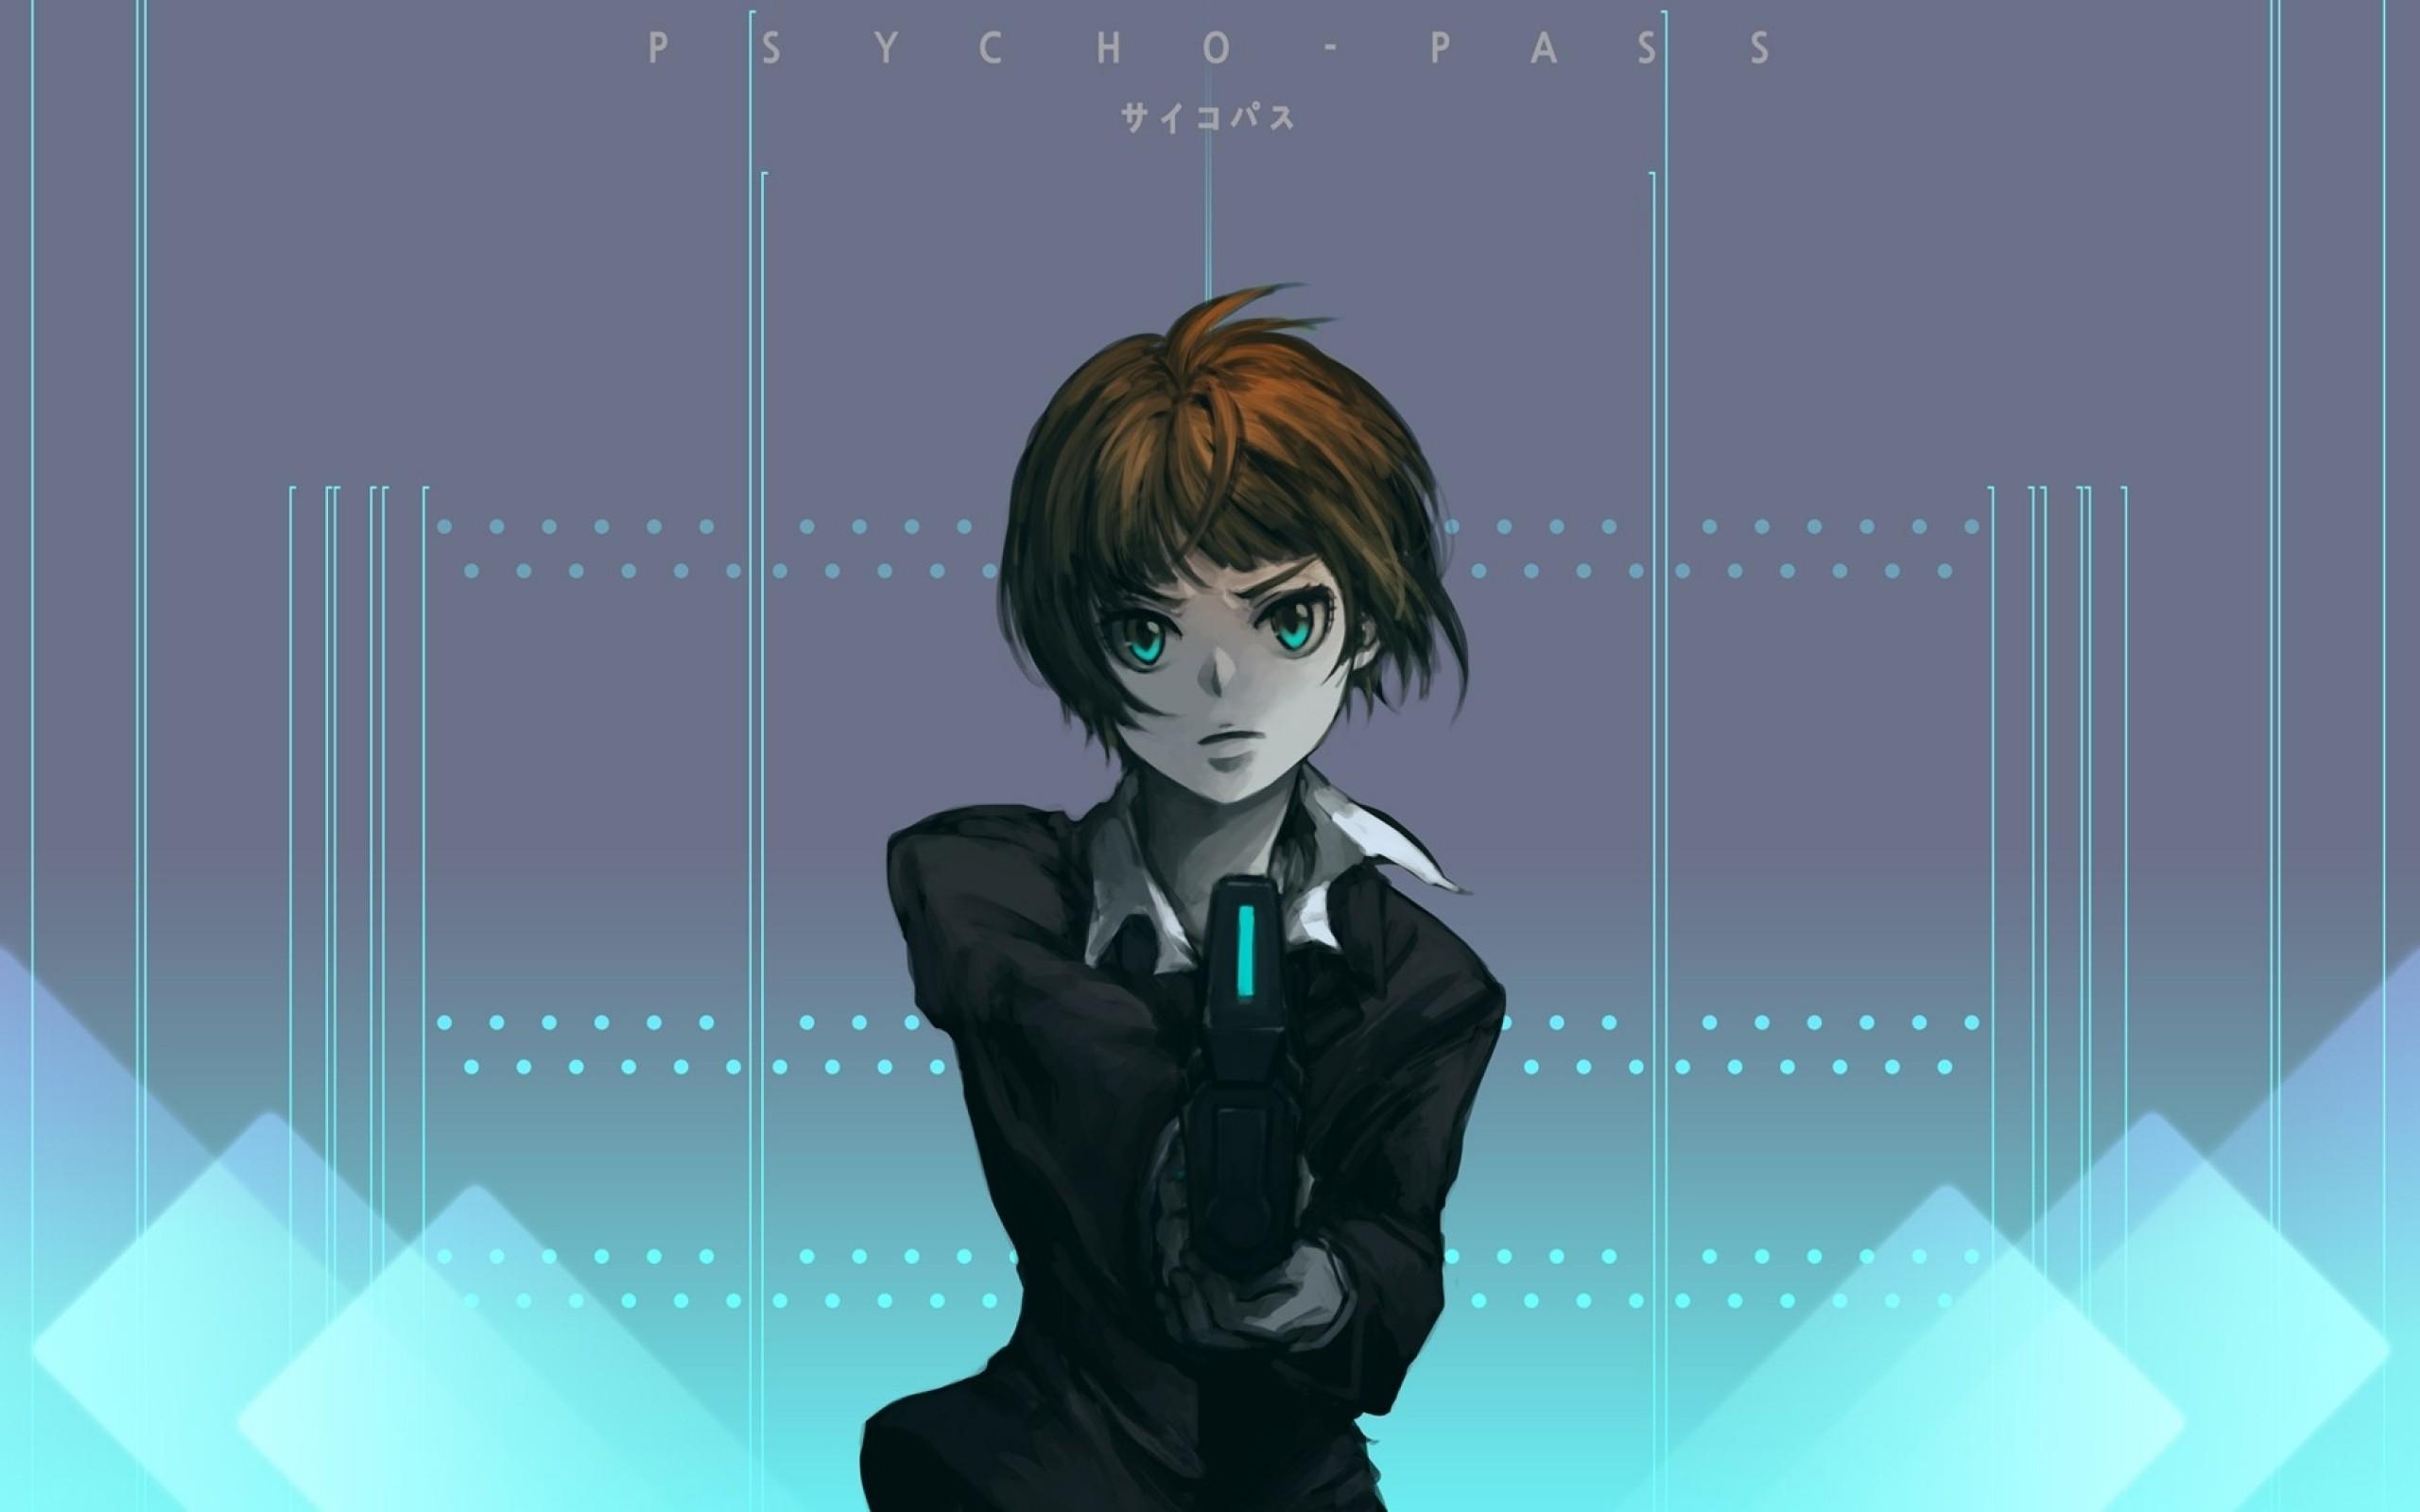 Psycho Pass Anime Anime Girls Tsunemori Akane Cyan Wallpaper Resolution 2560x1600 Id 625490 Wallha Com